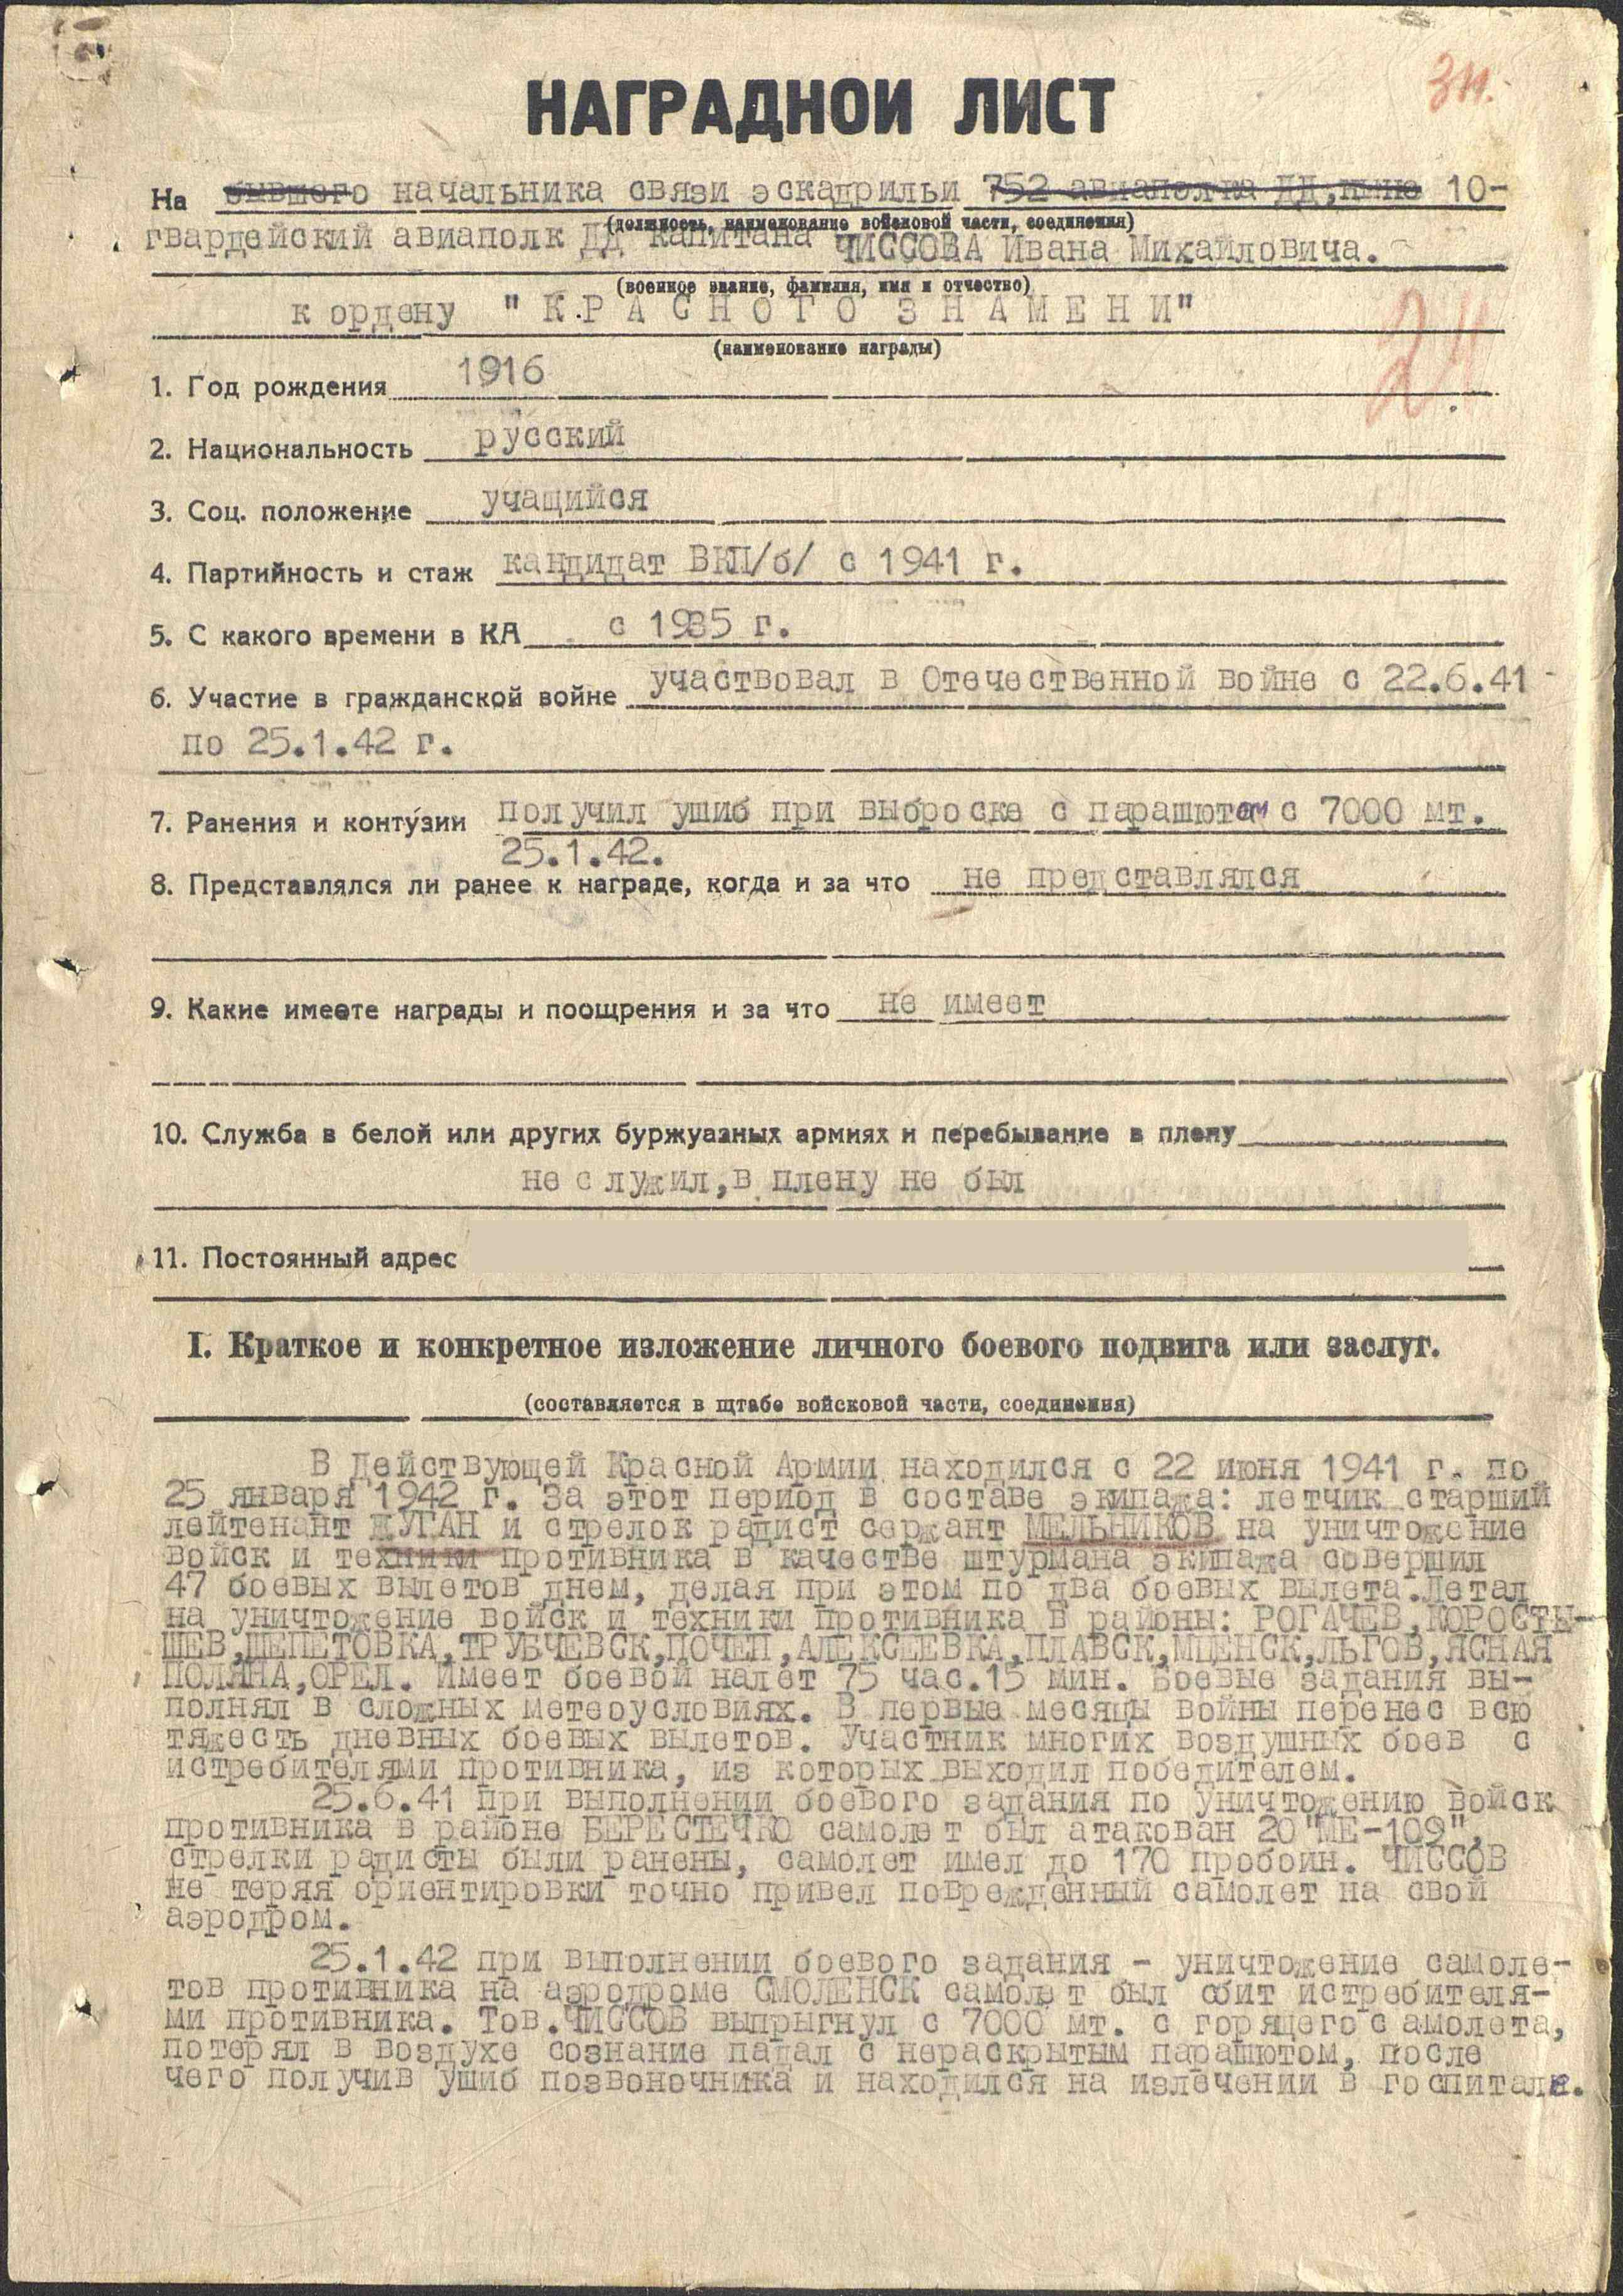 https://upload.wikimedia.org/wikipedia/commons/1/1b/Ivan_Chisov_Order_Of_The_Red_Banner_Document_1942.jpg